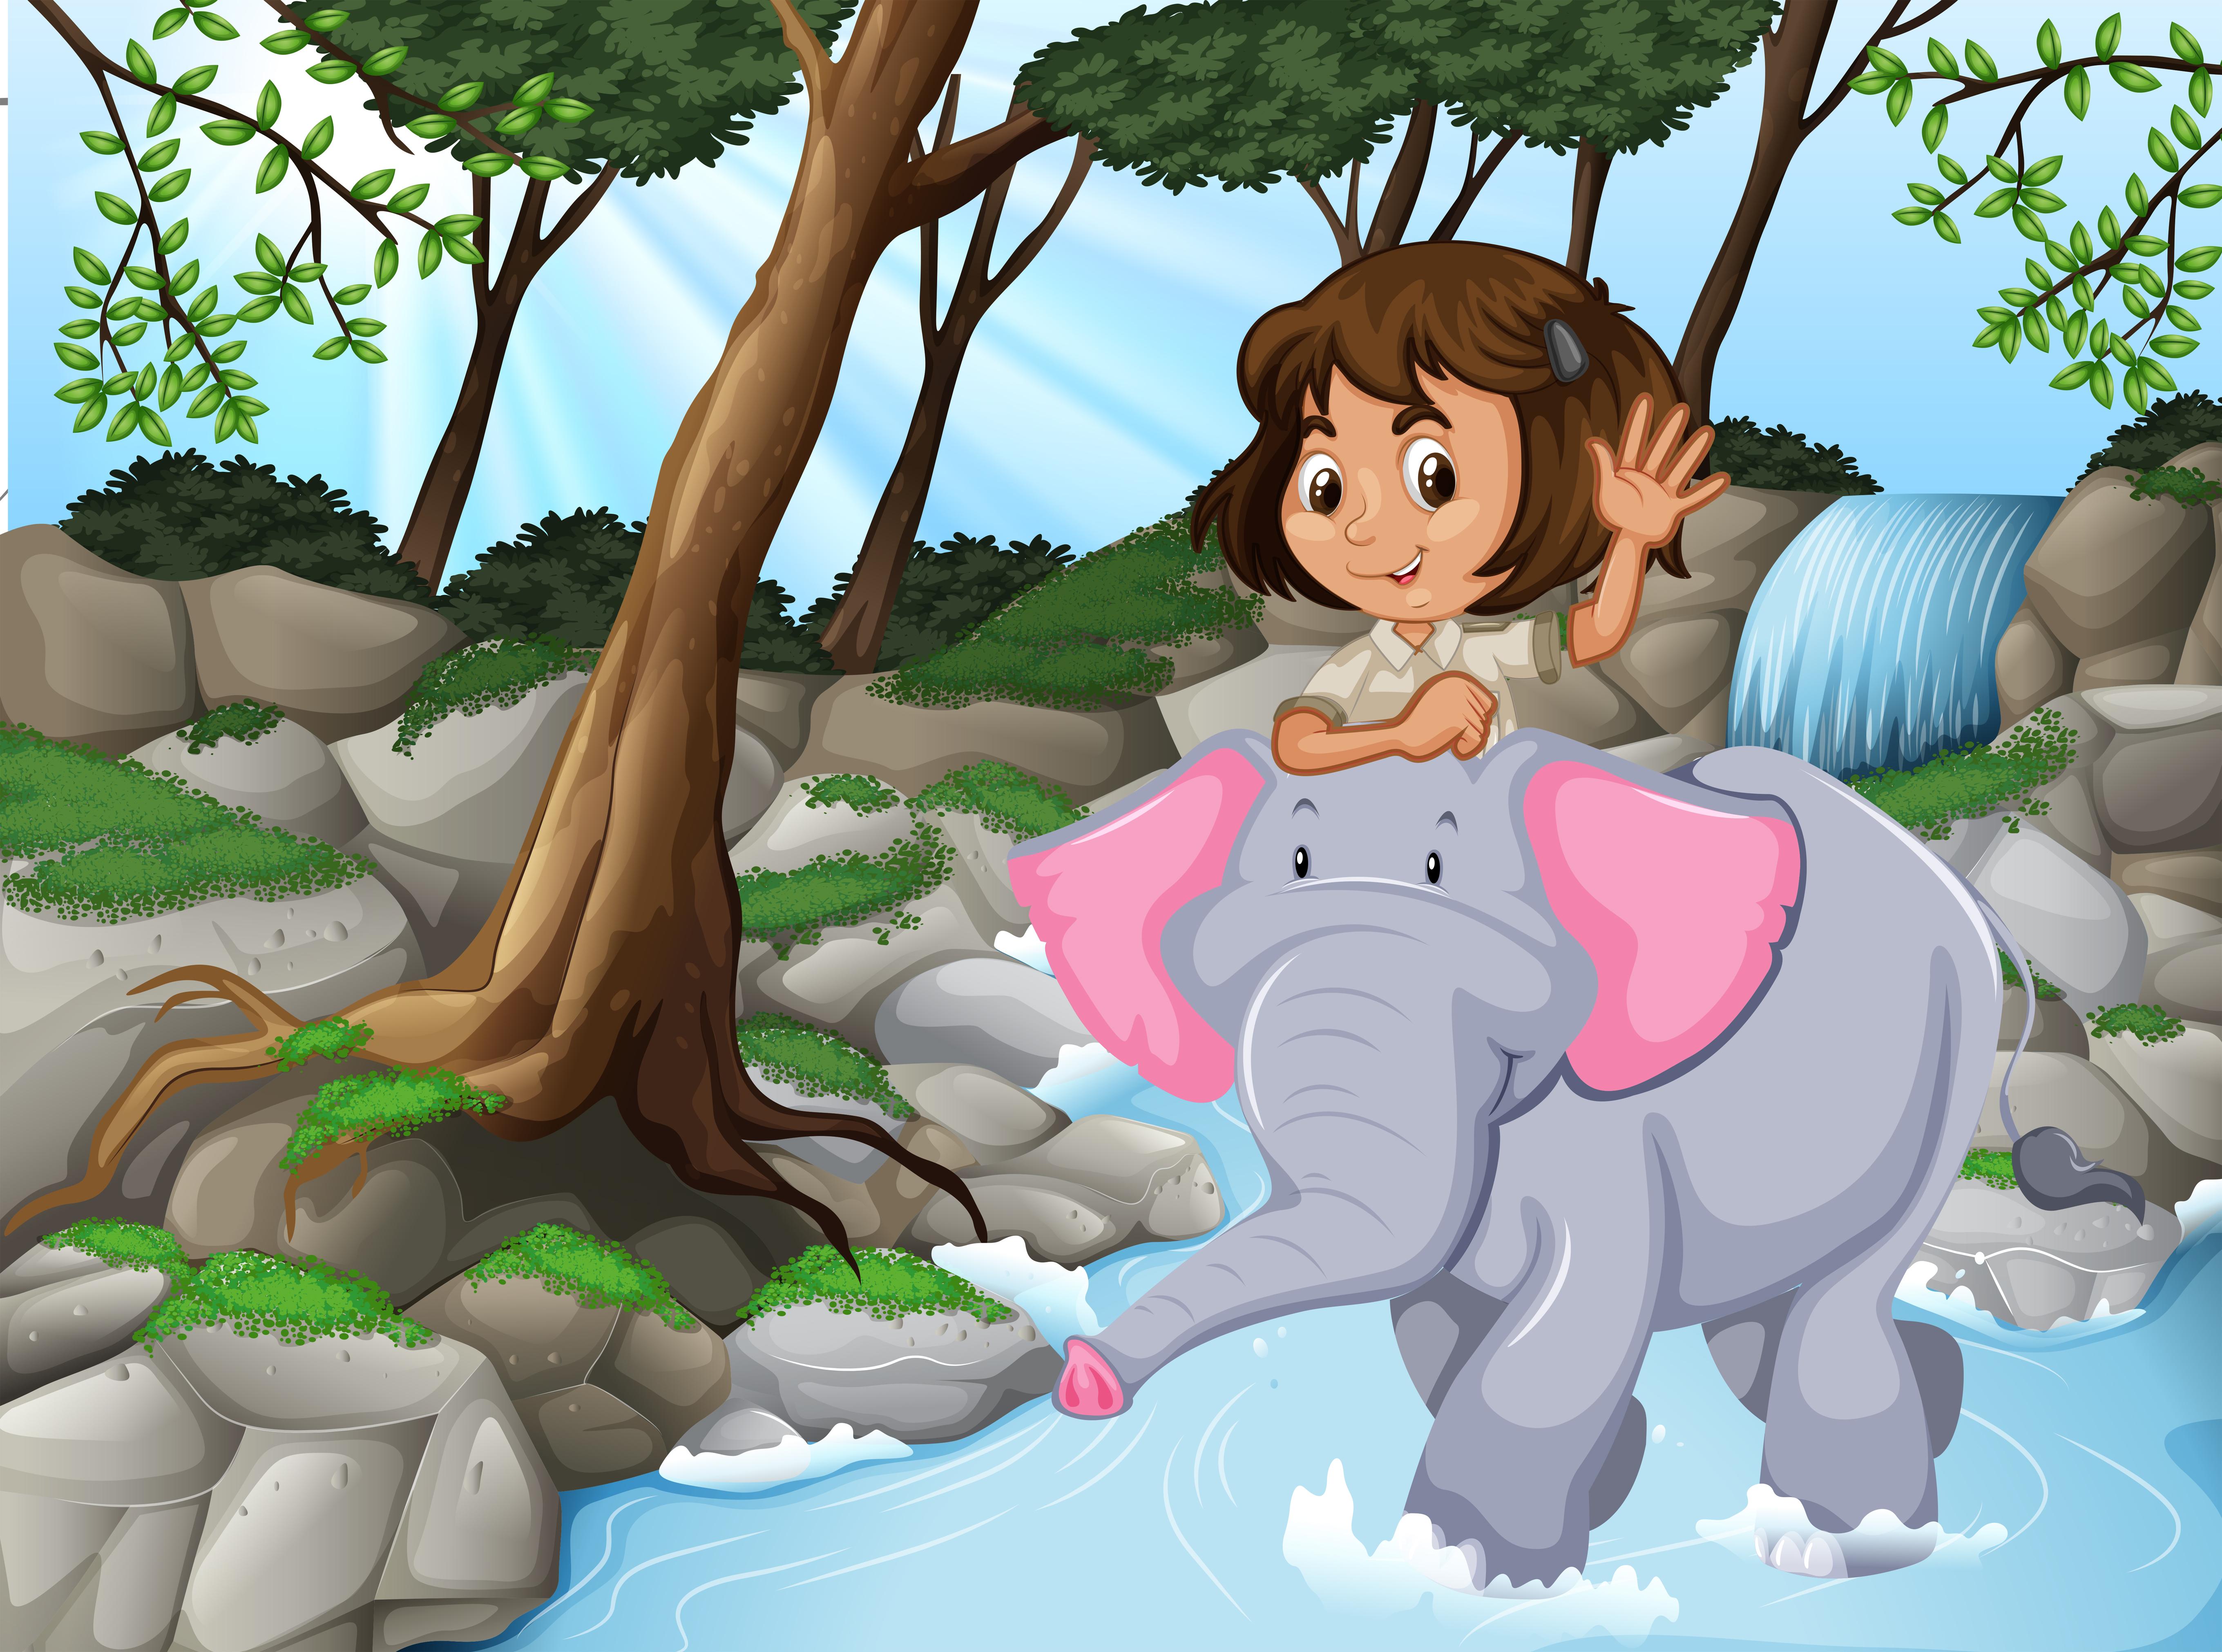 girl riding elephant jungle scene - Download Free Vectors ...